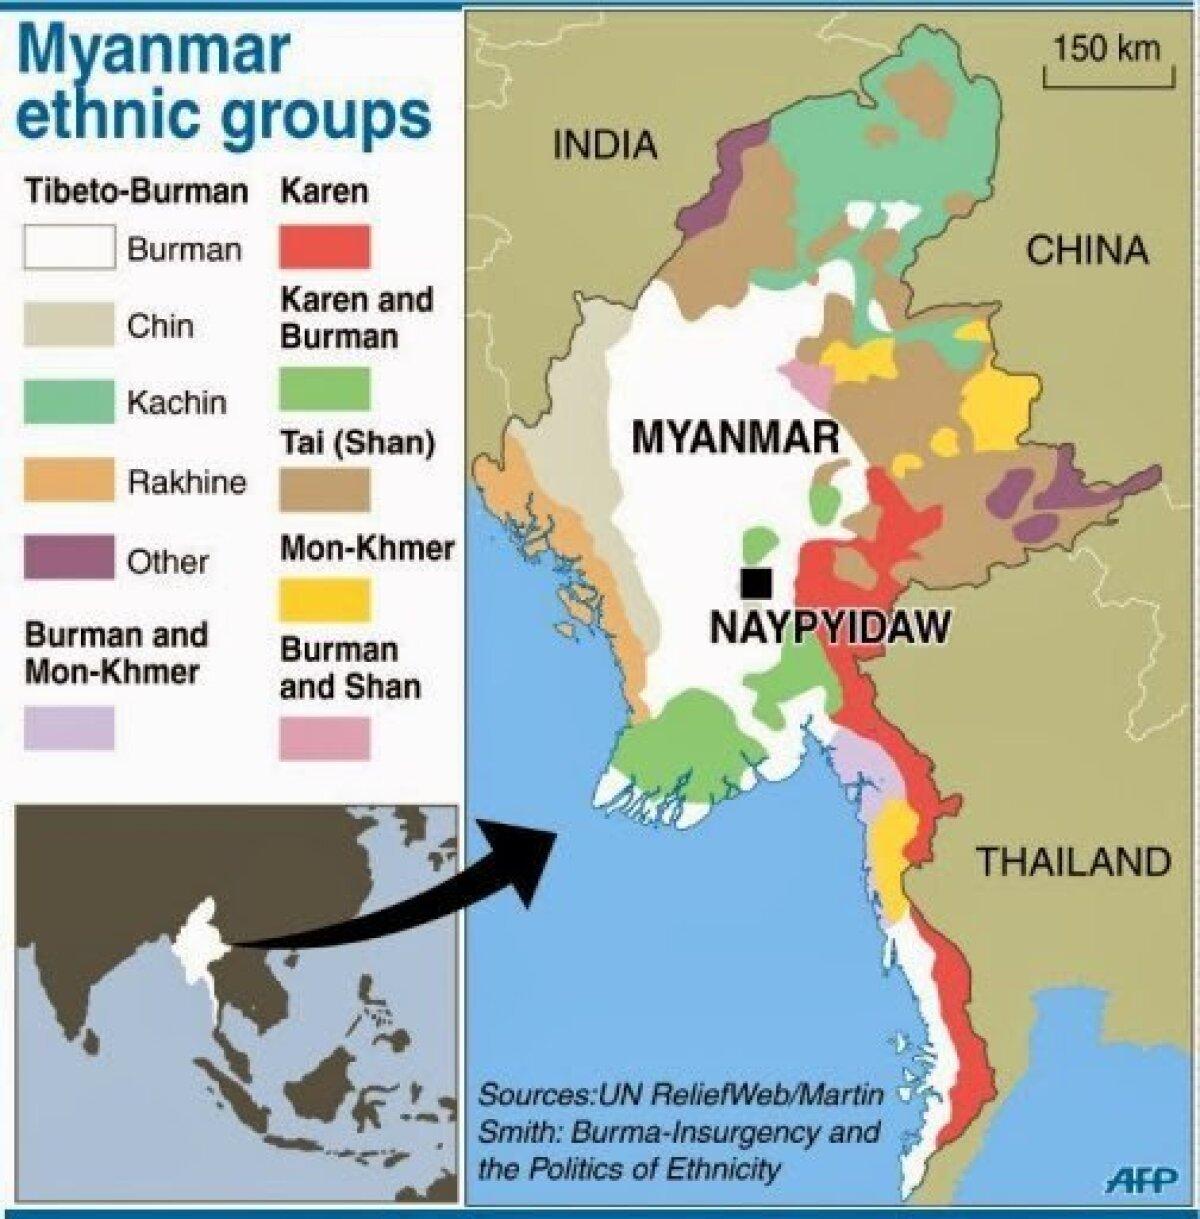 Birma (Myanmari) rahvusgrupid